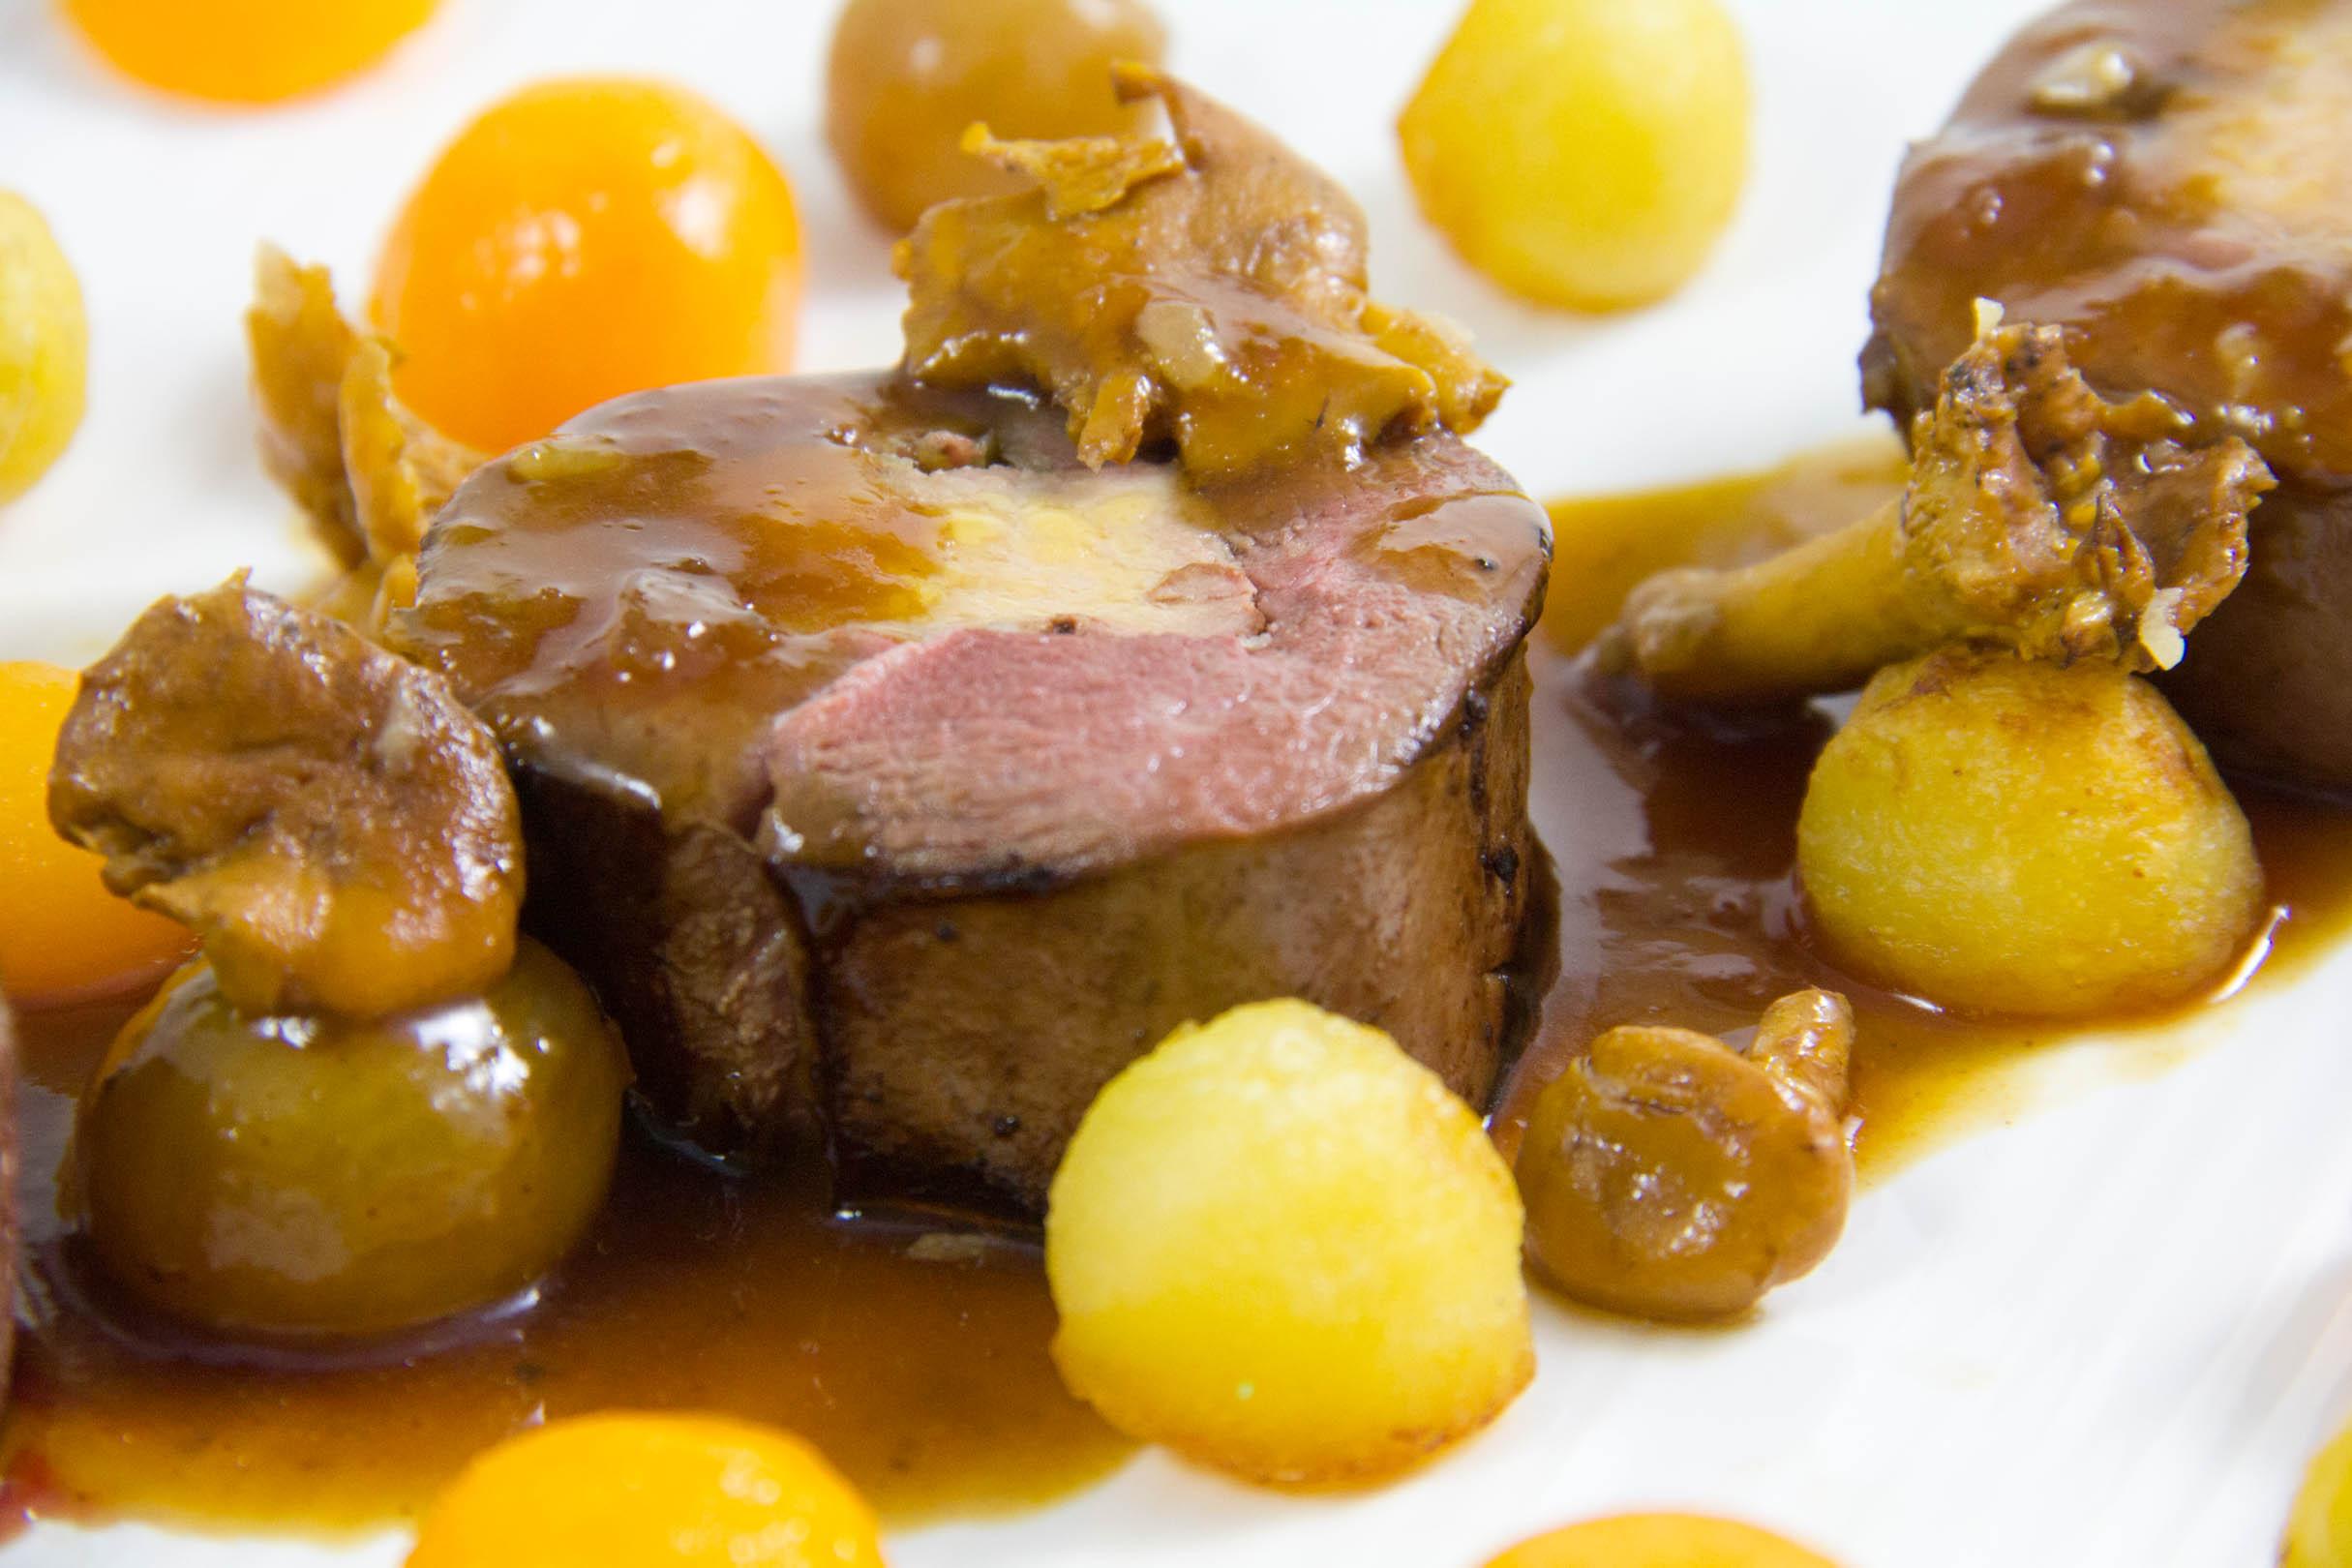 Magret Canard Foie Gras Four magret de canard farci au foie gras, sauce au raisin de